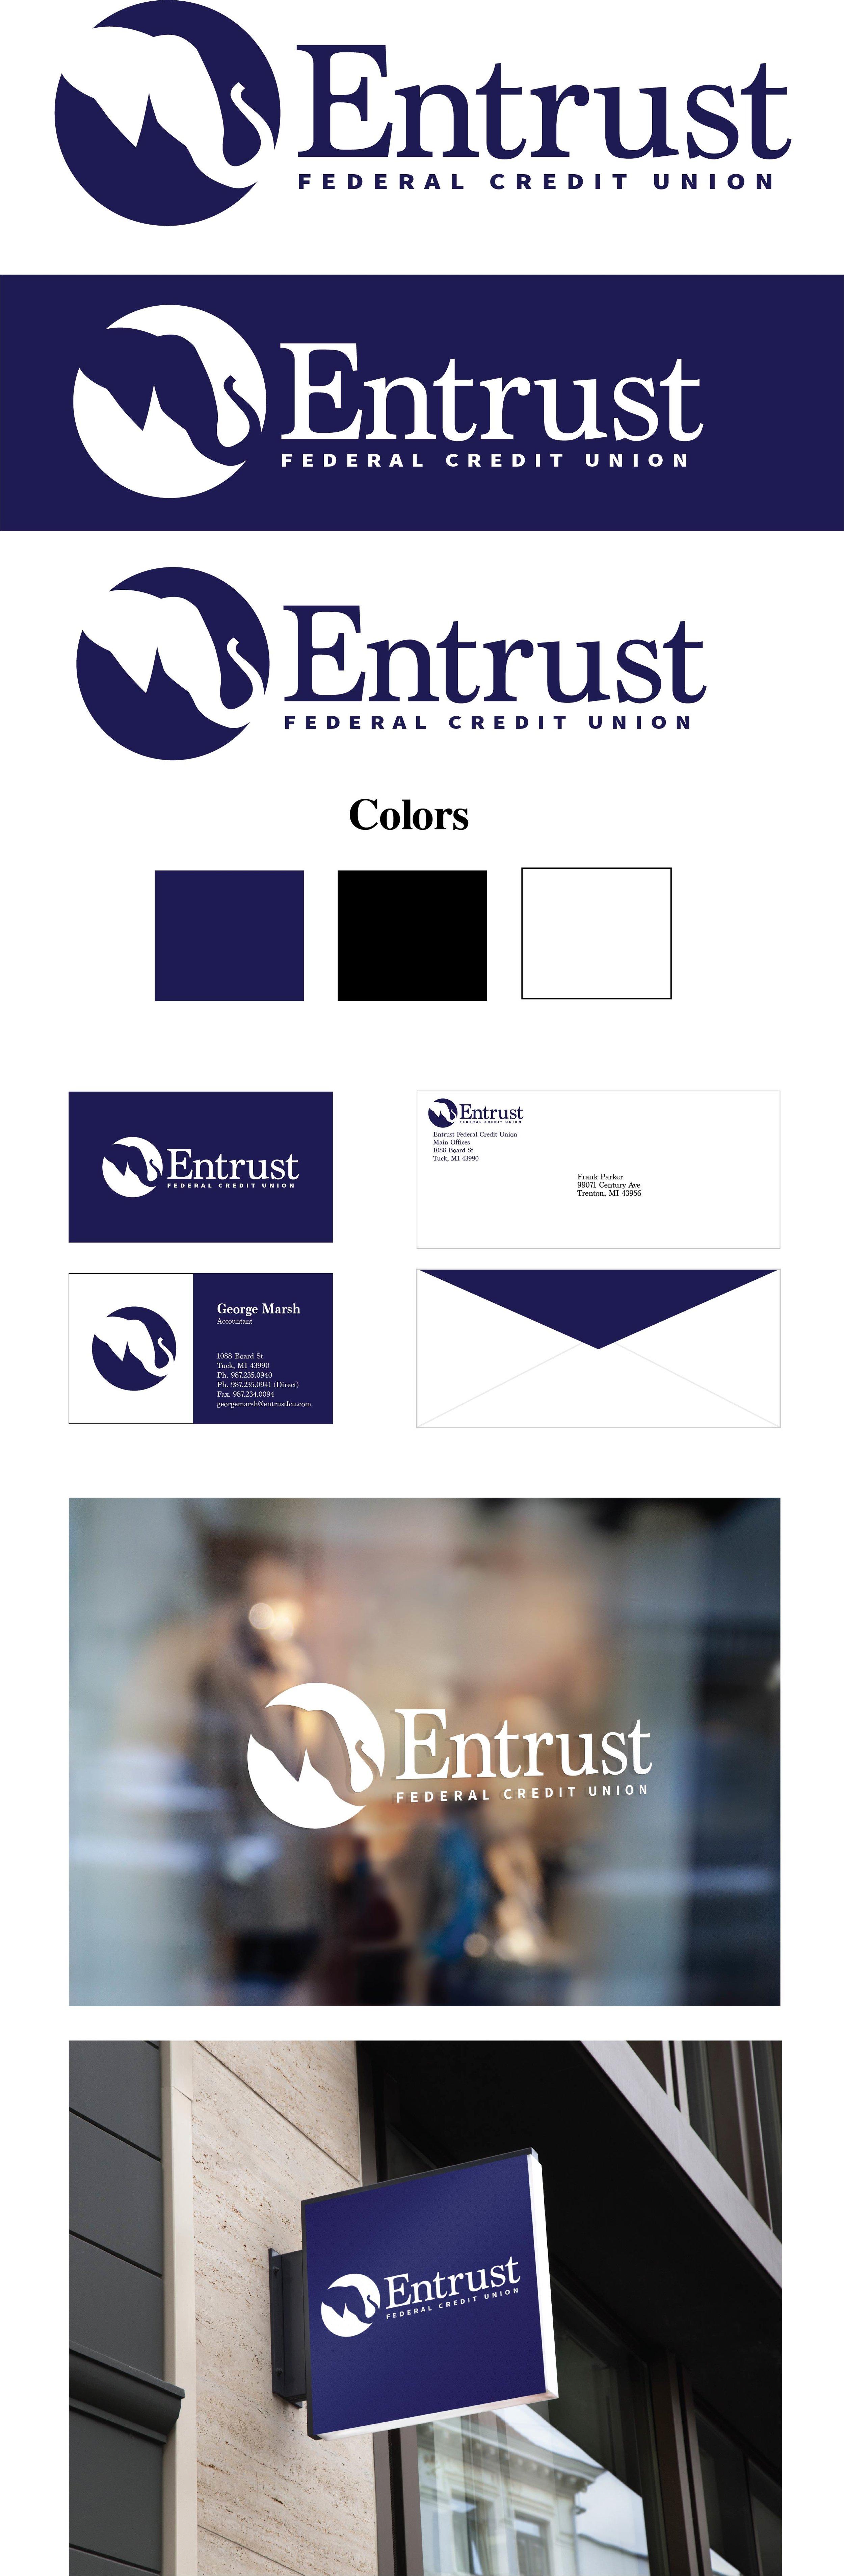 Entrust Process.jpg